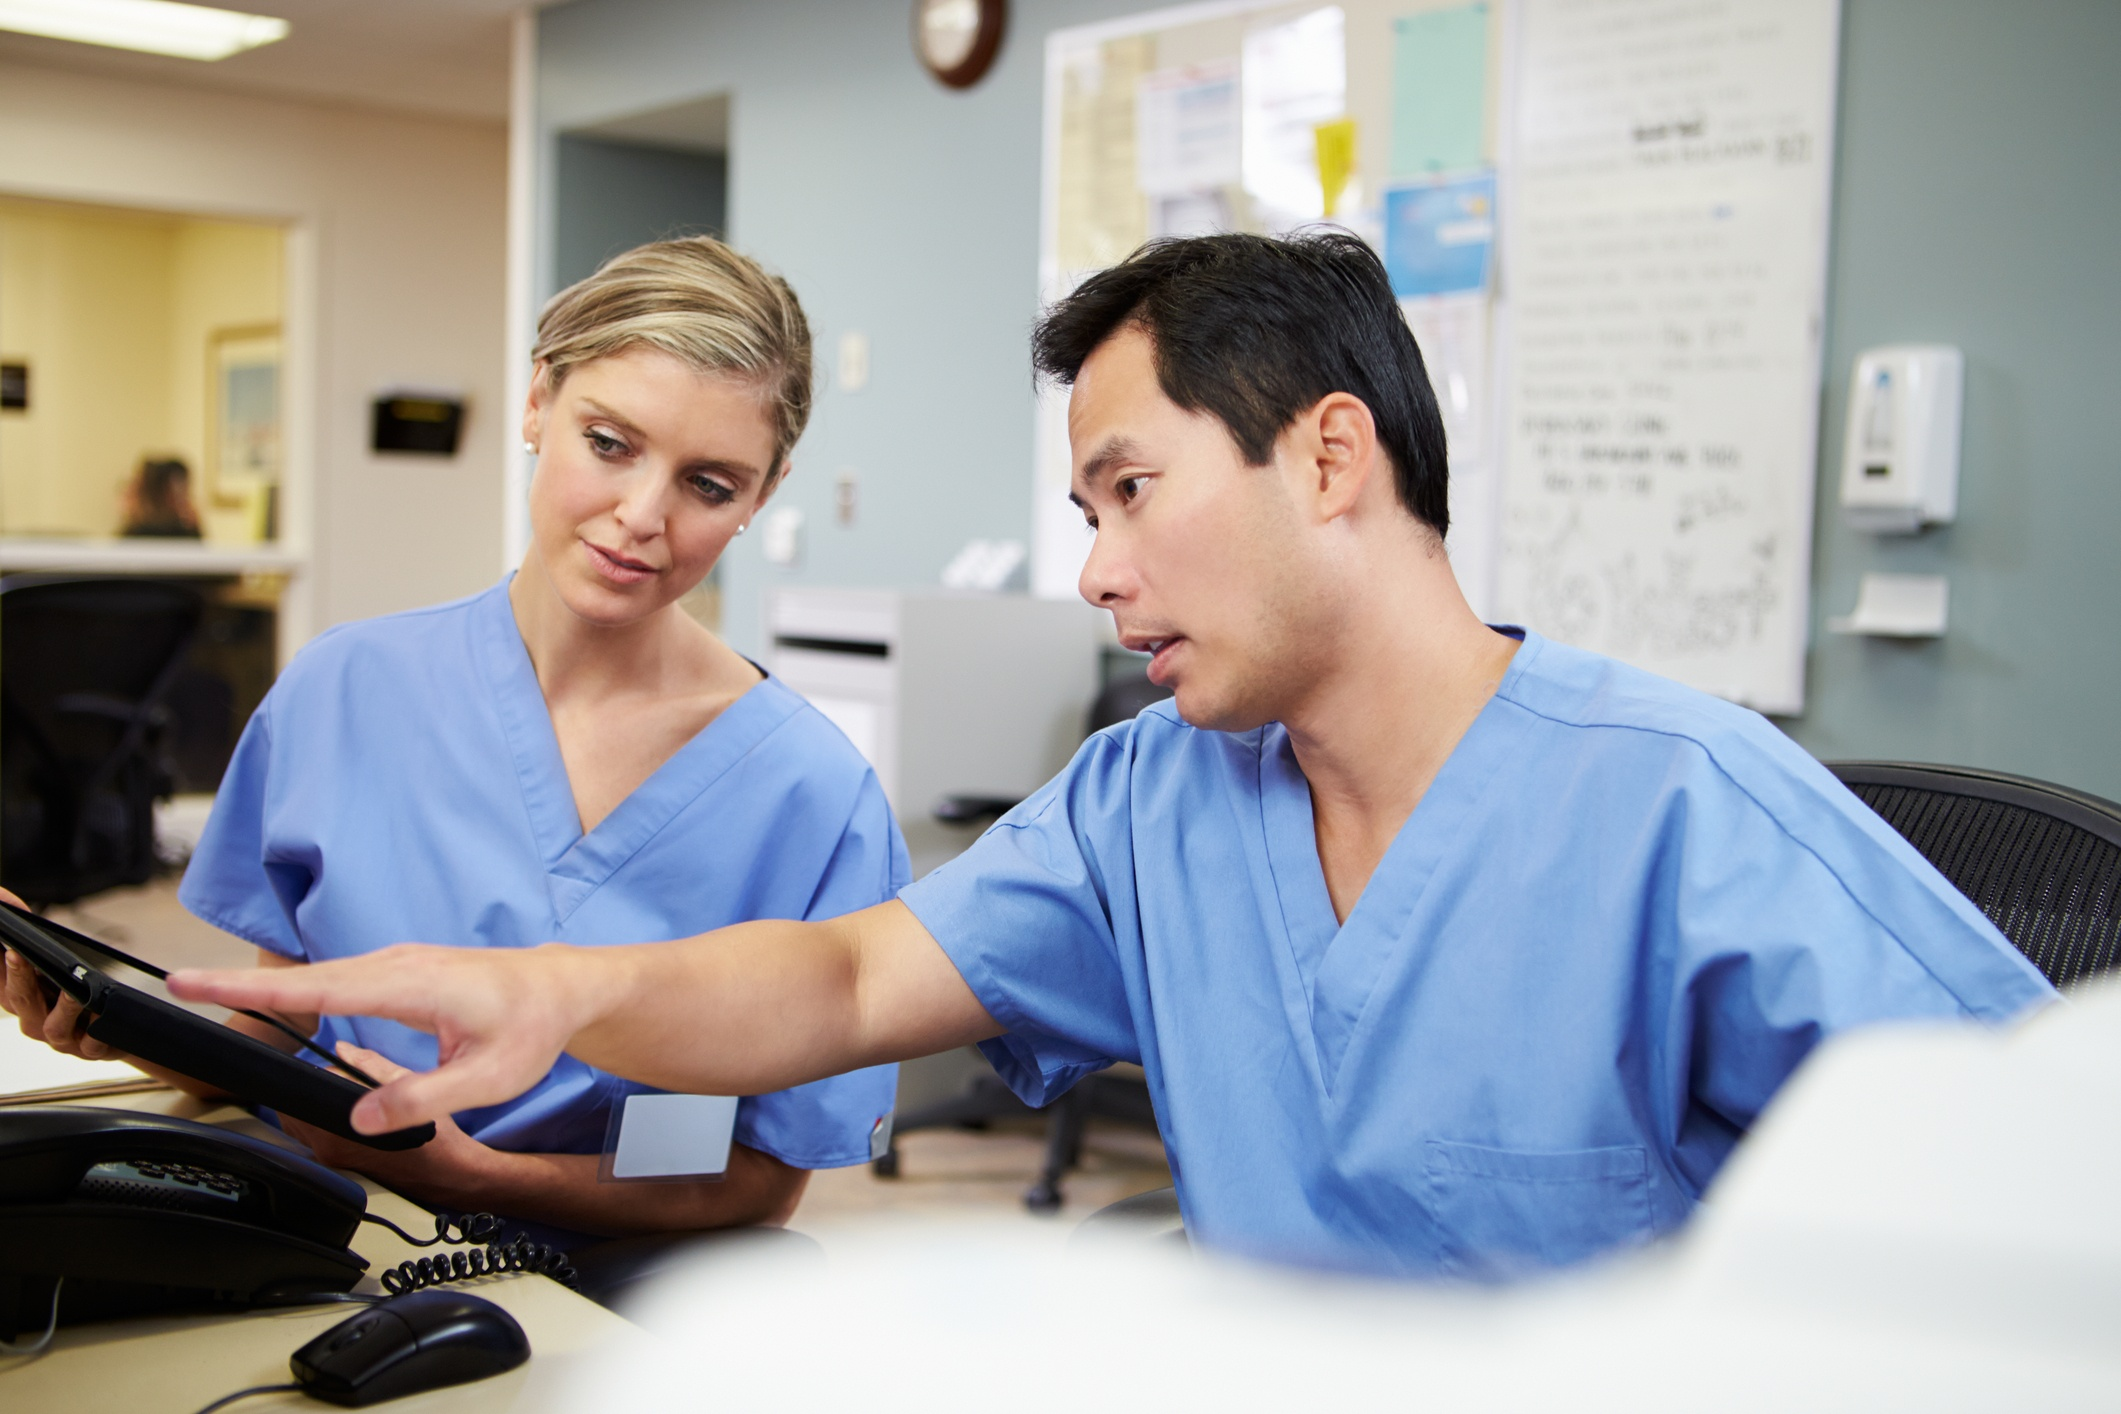 Nurse Credentialing for Contractors: Big Winner or Major Pain?